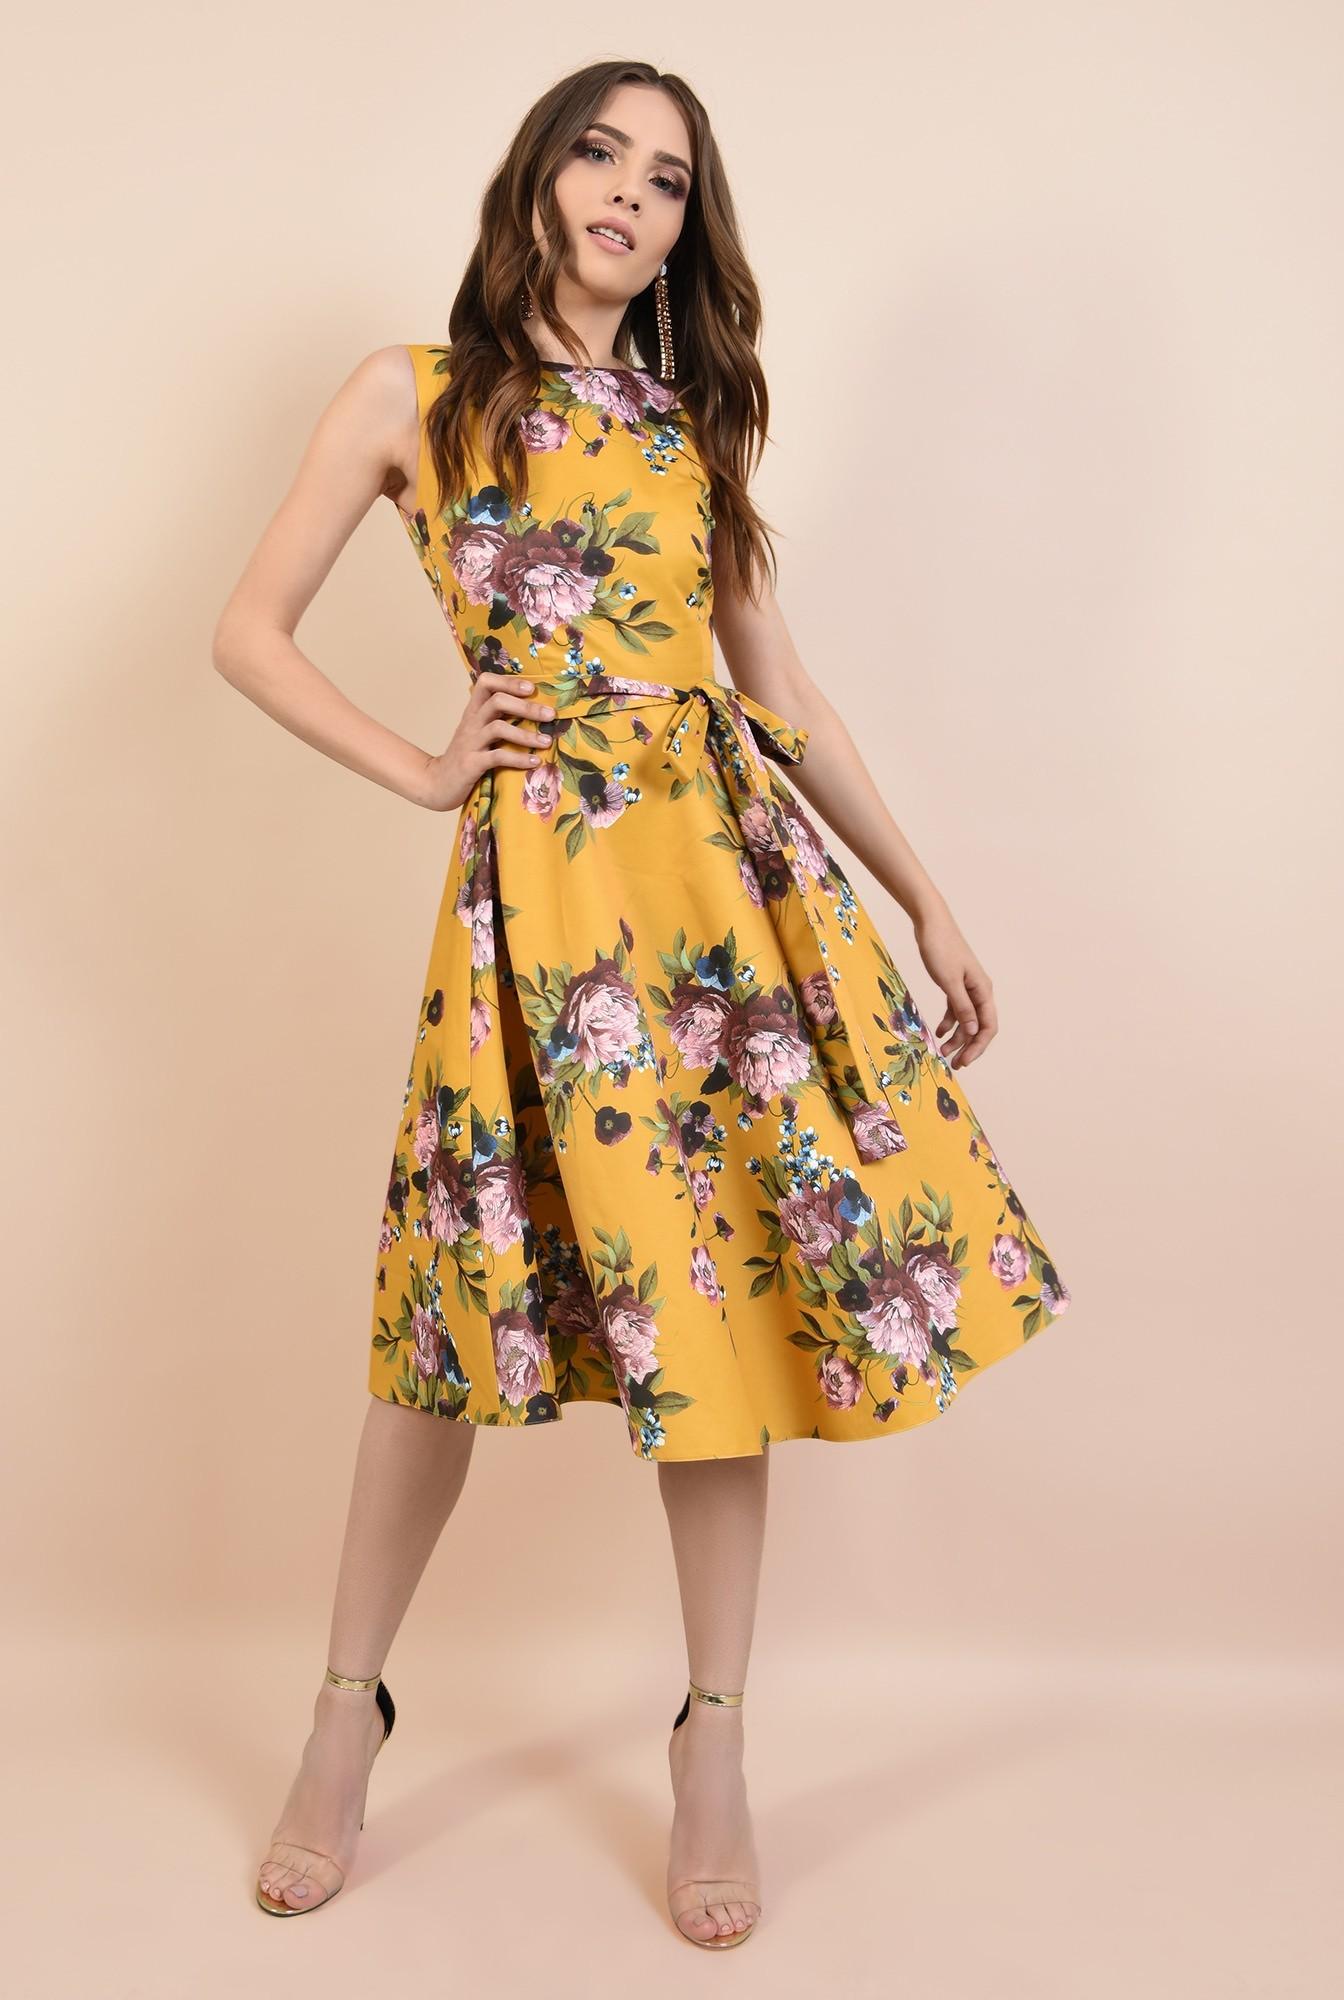 3 - rochie de seara, cu croi evazata, imprimeu floral, cordon cu funda la talie